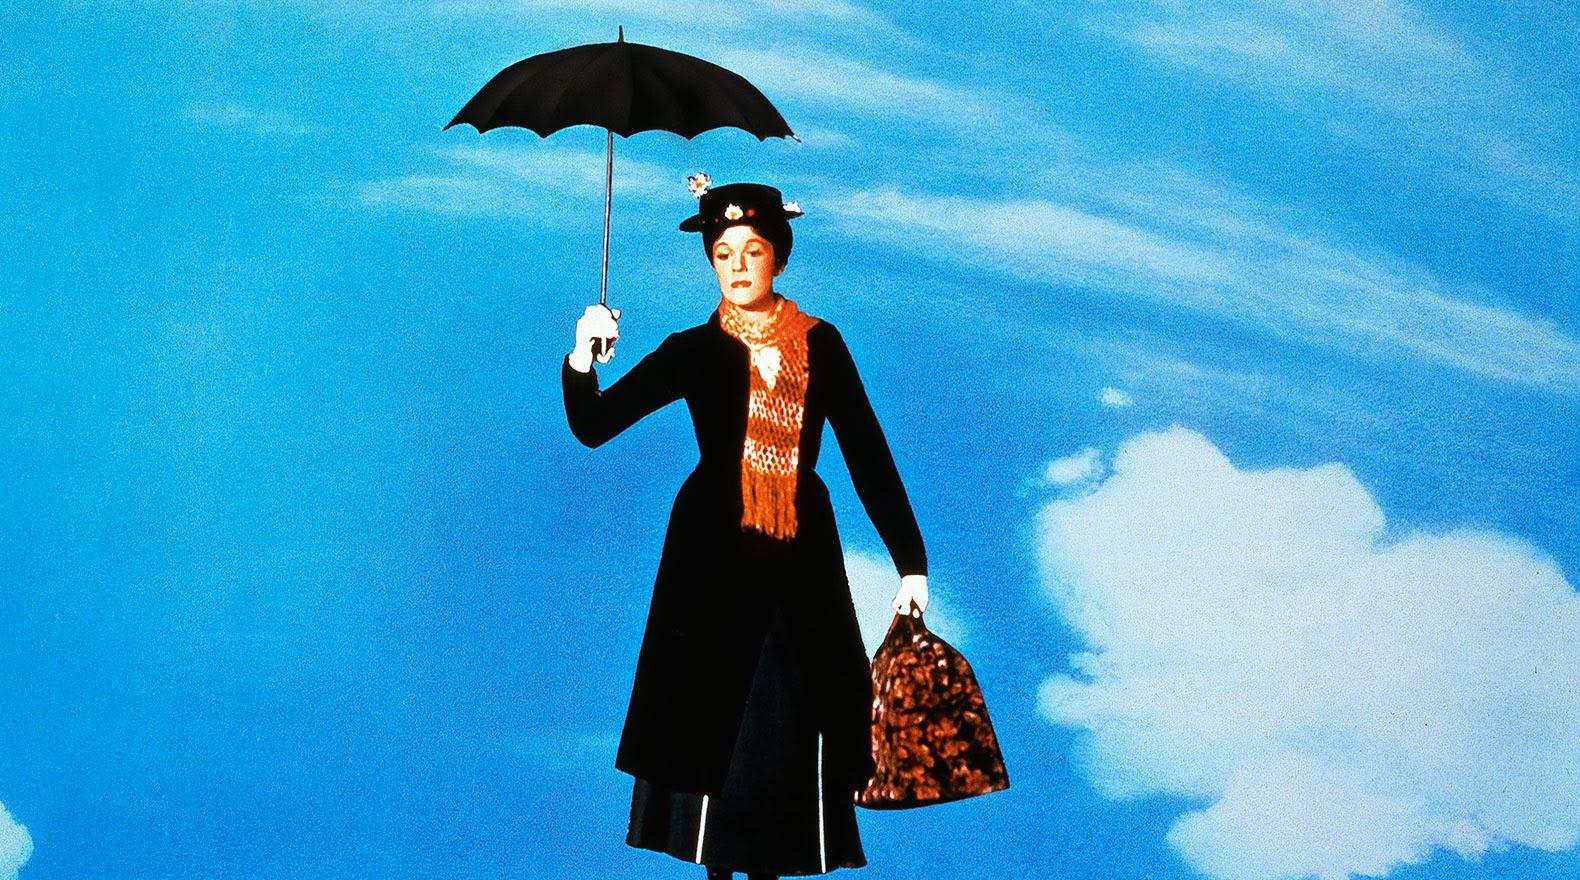 Mary Poppins flying